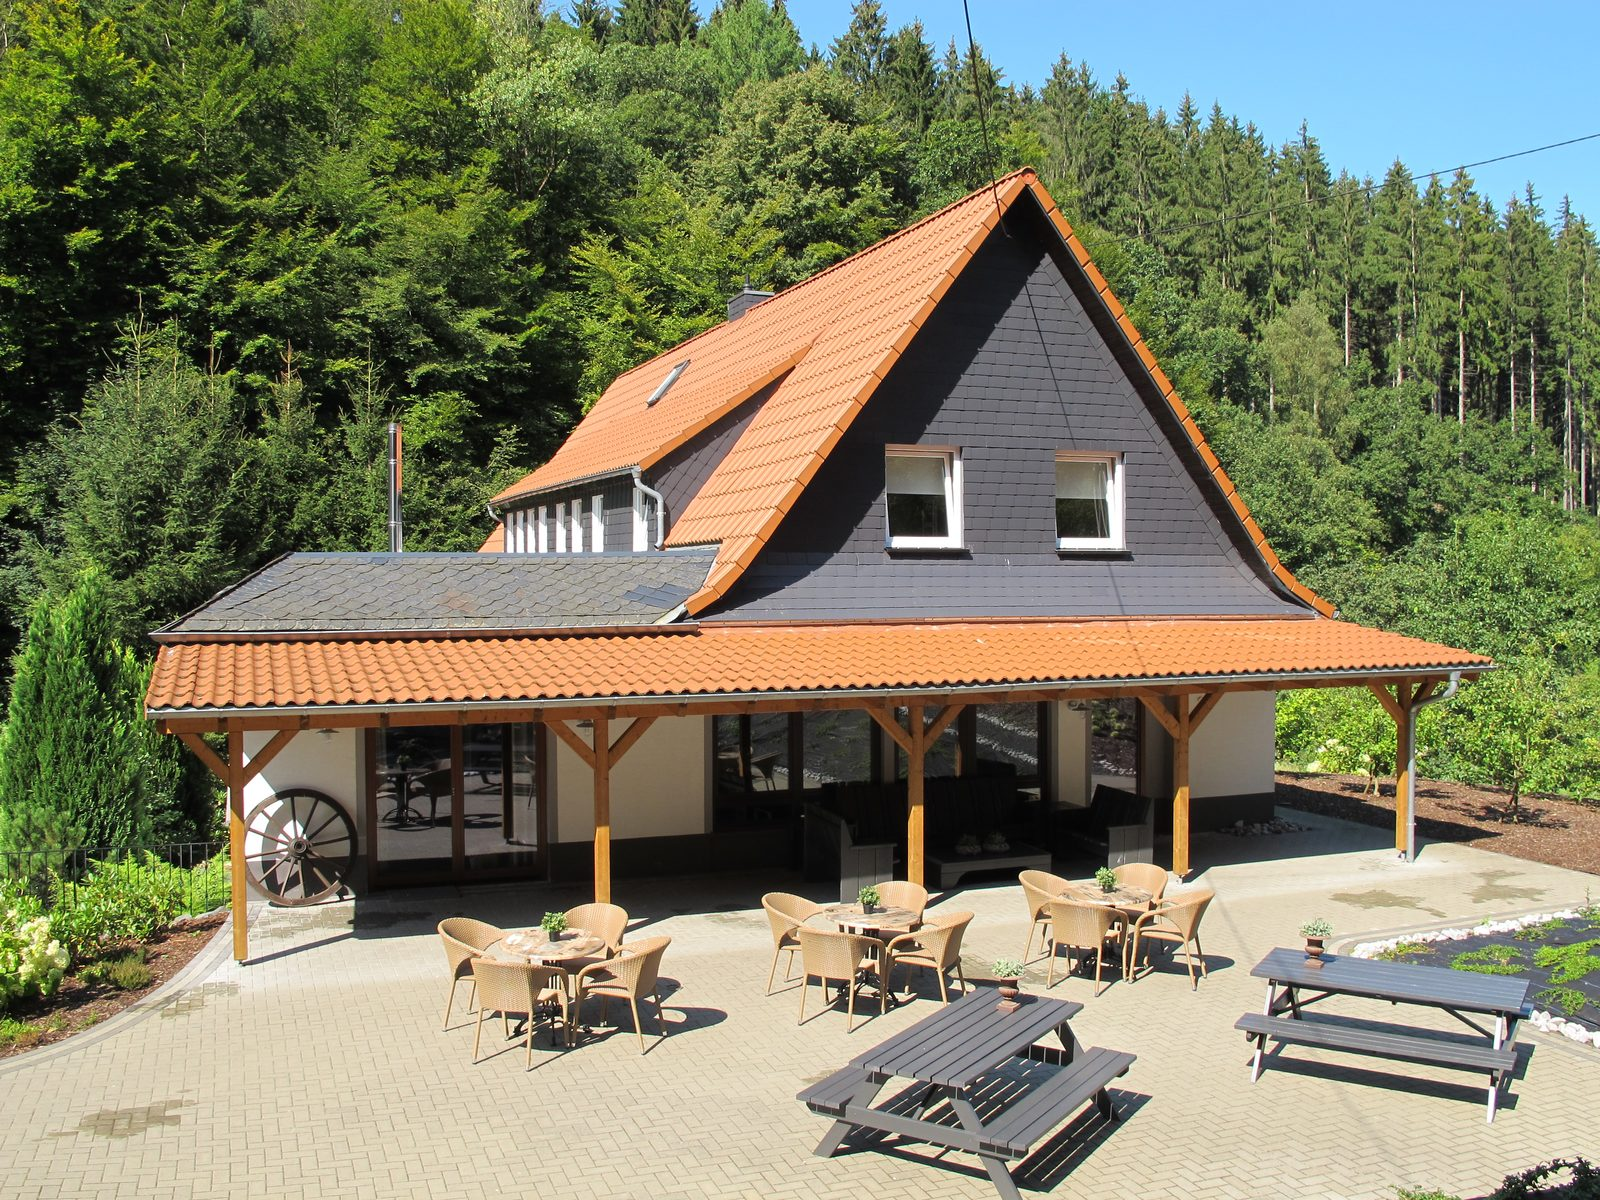 Huize Schutzbach, vakantievilla in Westerwald Duitsland